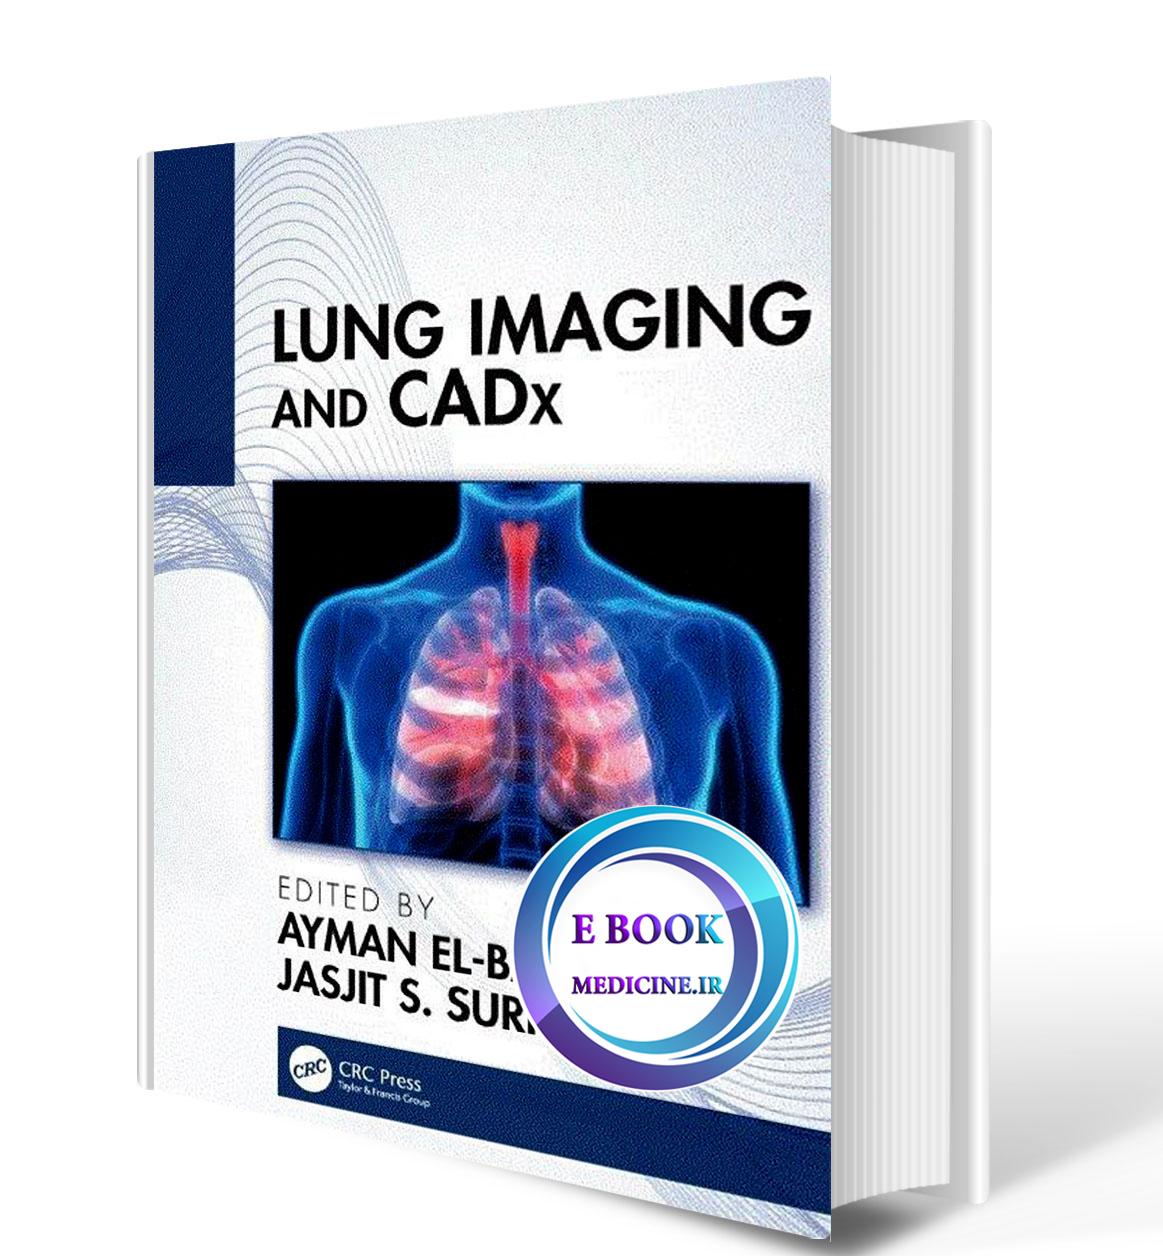 دانلود کتاب Lung Imaging and CADx  2019